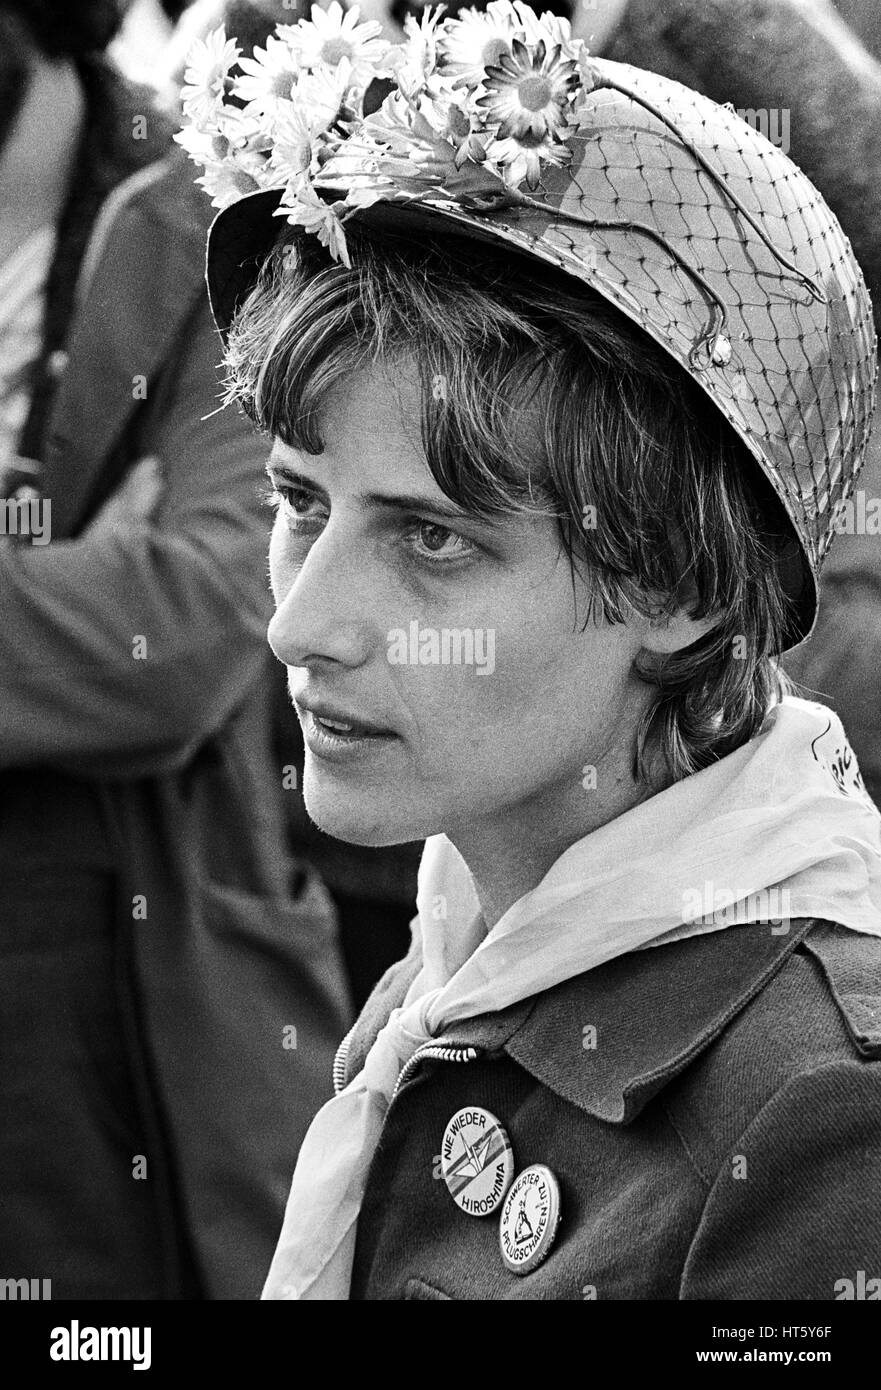 Mutlangen, Allemagne, 01.Sept.1983: PETRA KELLY (* 29 novembre 1947, † probablement le 1er octobre 1992), Photo Stock